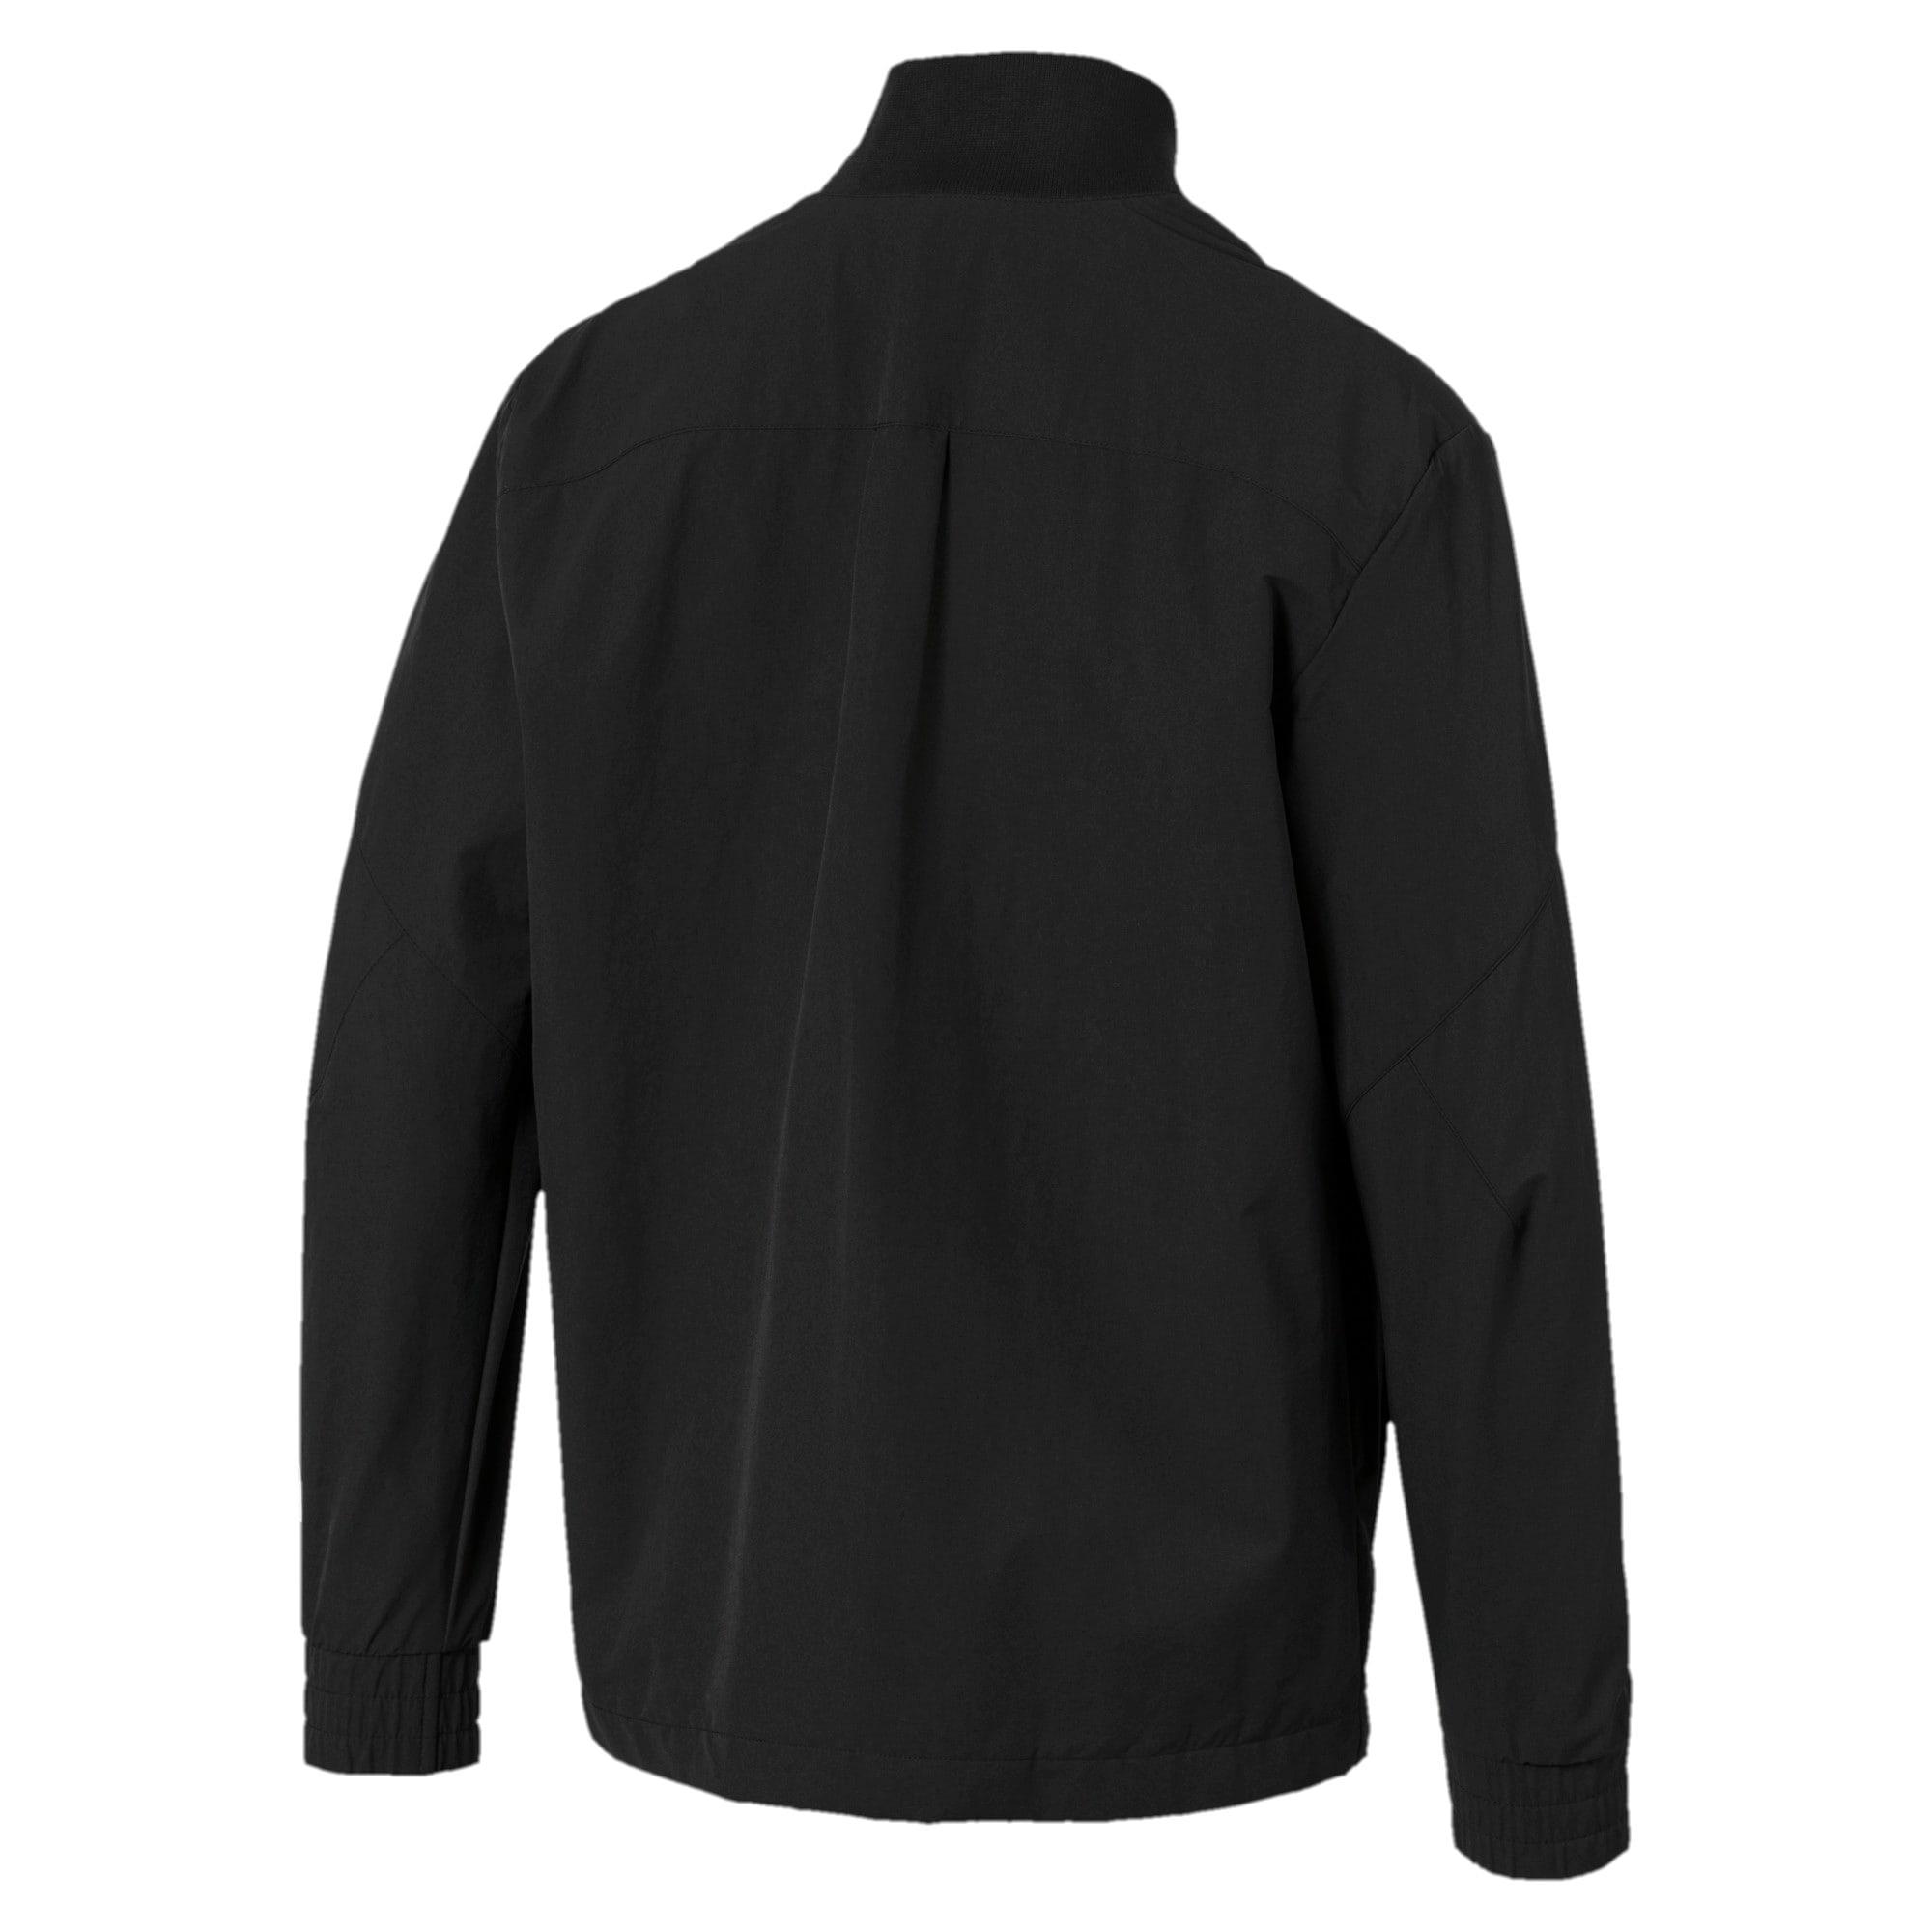 Miniatura 5 de Chaqueta tejida NU-TILITY para hombre, Puma Black, mediano